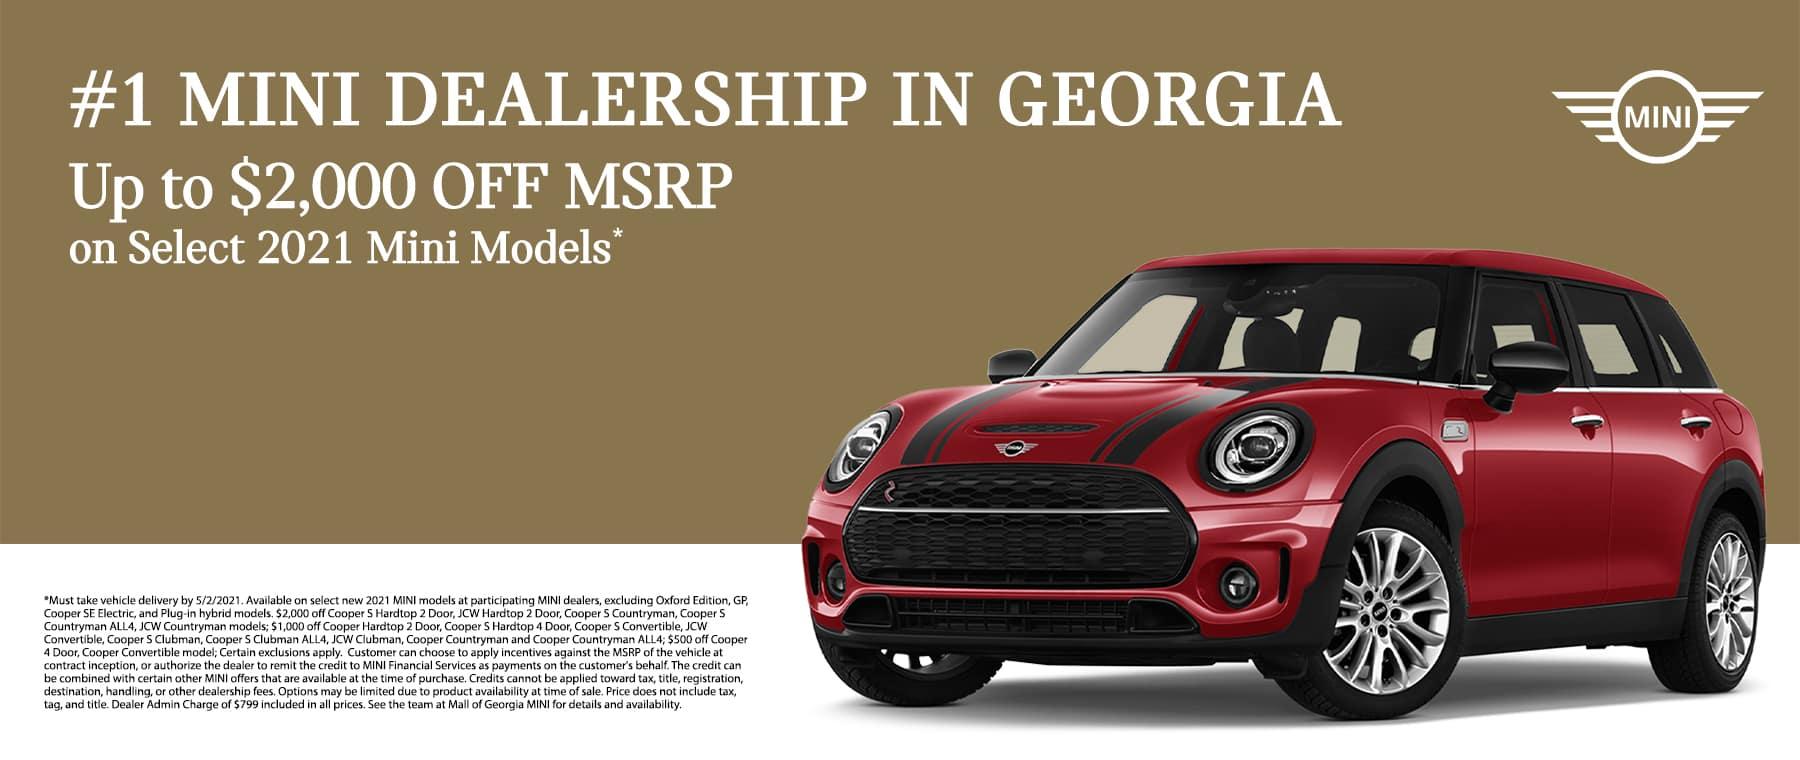 MOG Mini-Apr21_TR_New Vehicle Incentives 1800x760_0001_#1